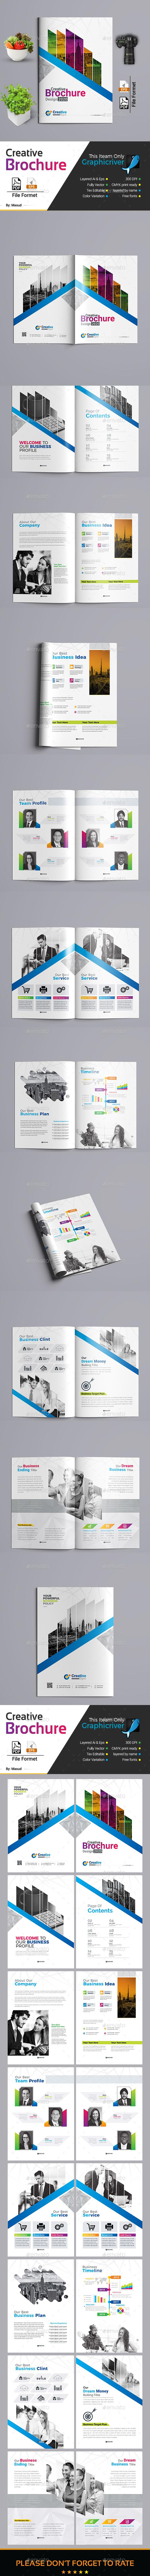 Creative Brochure - Brochures Print Templates